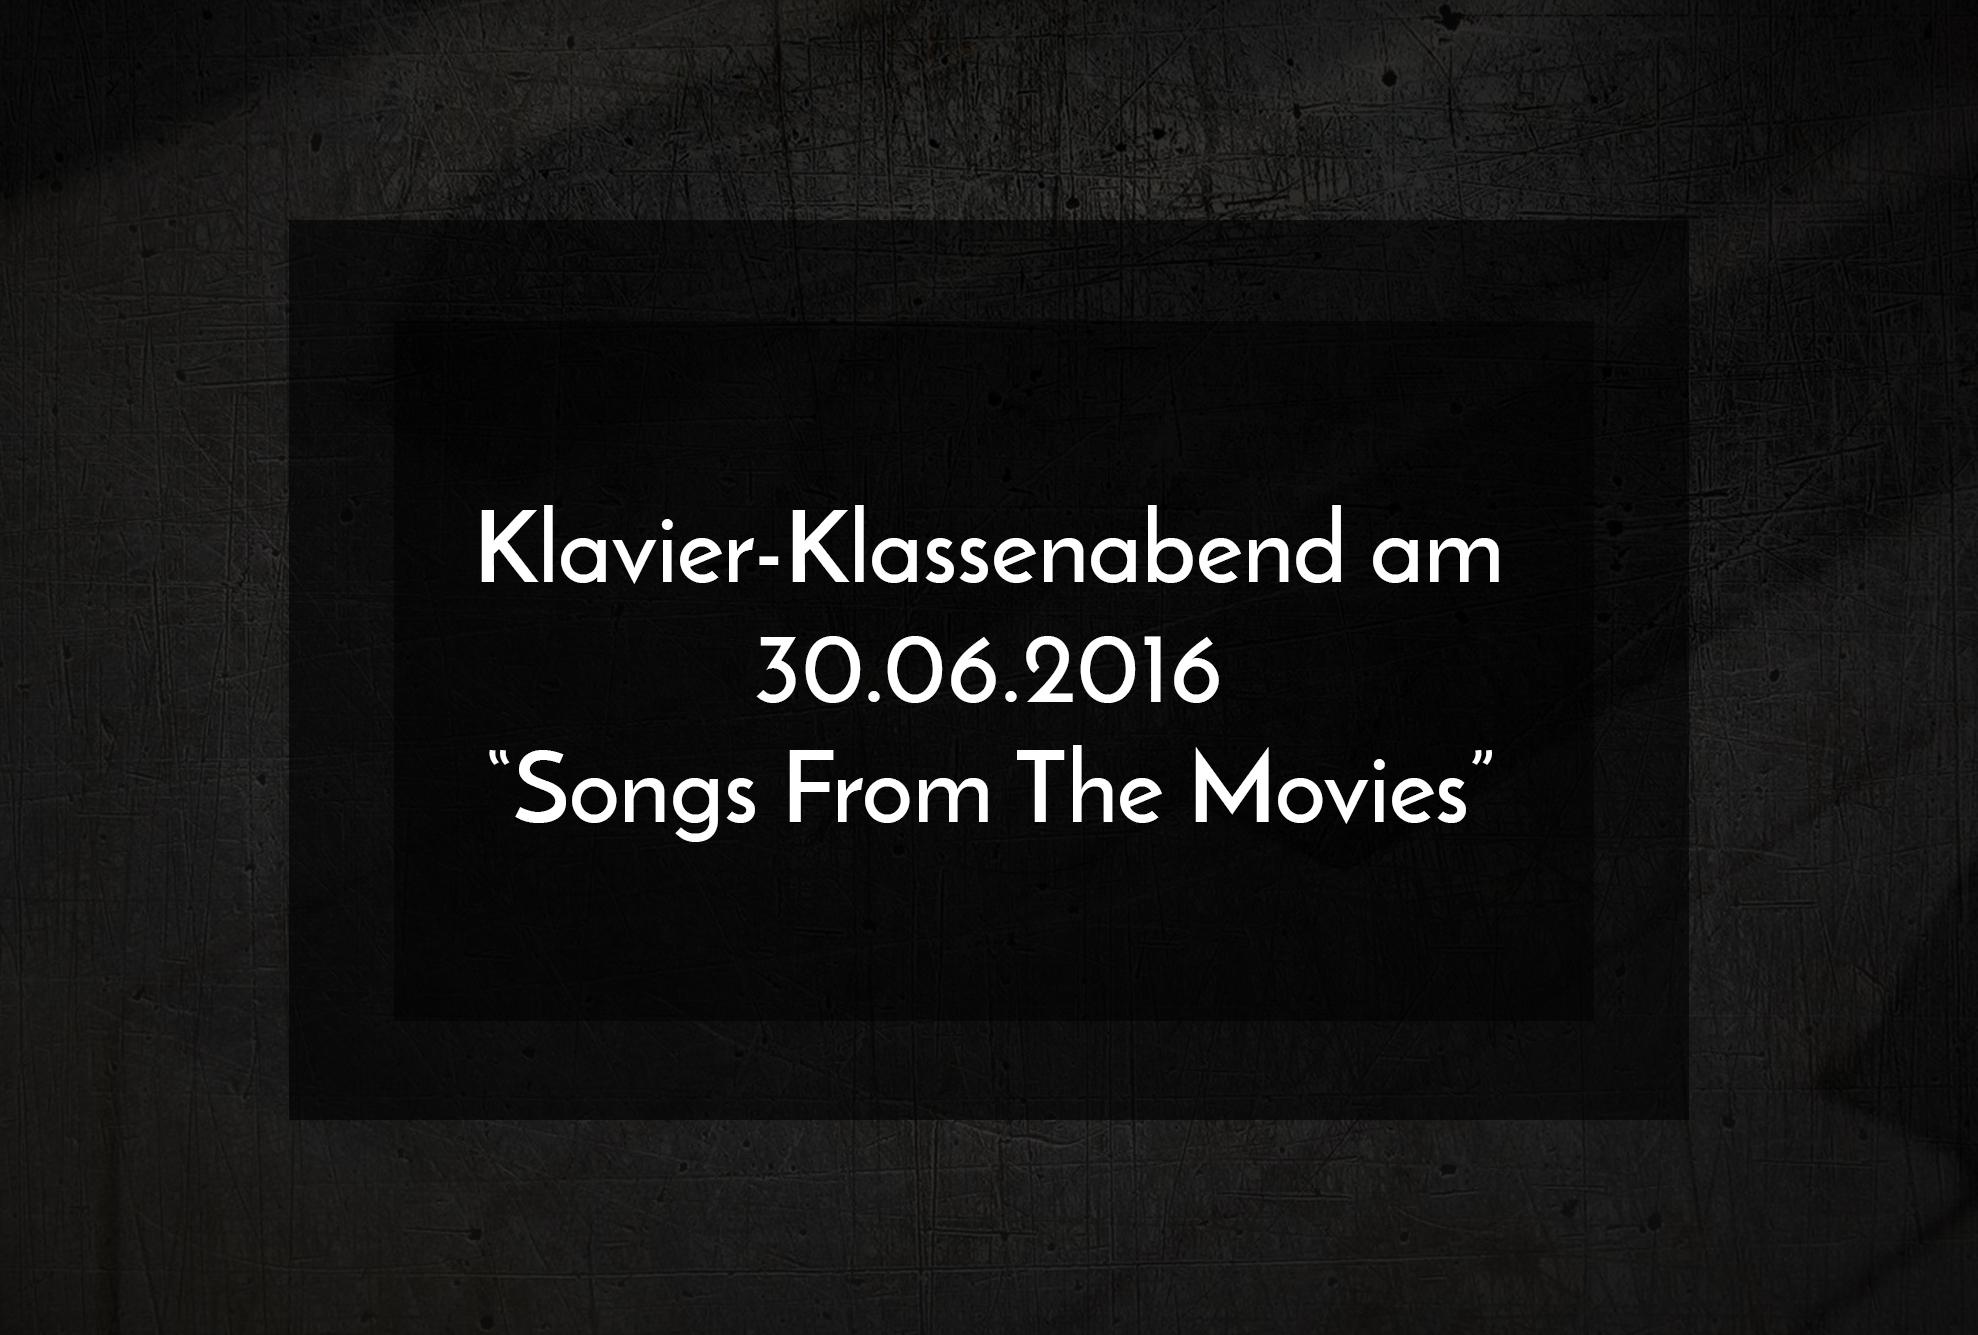 "Klavier-Klassenabend am 30.06.2016 ""Songs From The Movies"""